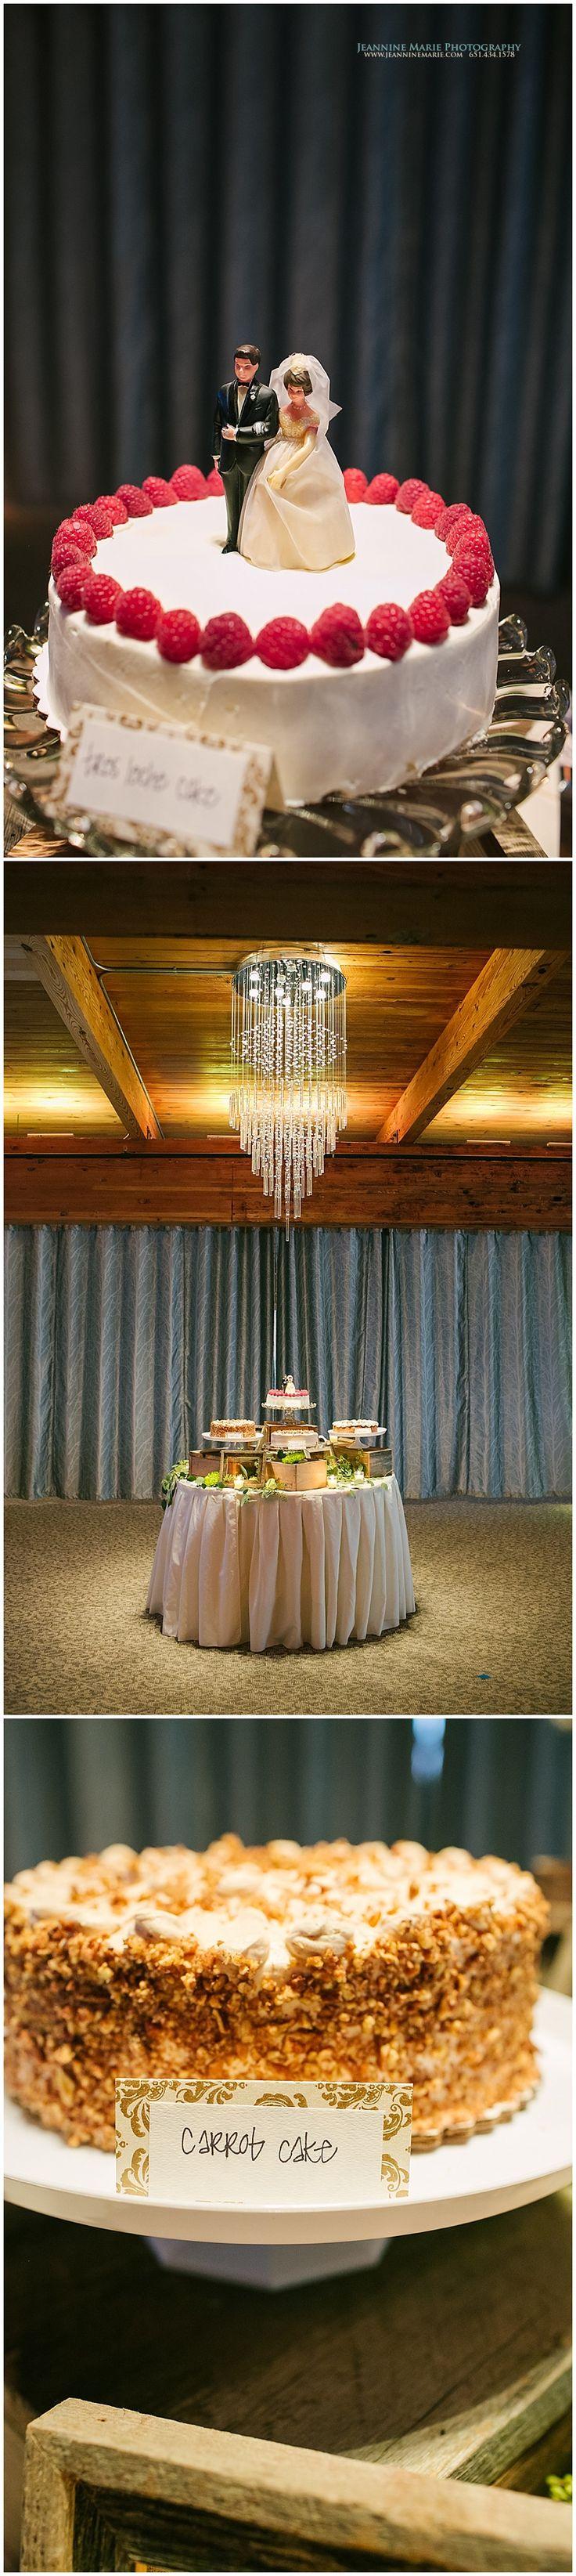 Wedding desserts designed by Cafe Latte Twin